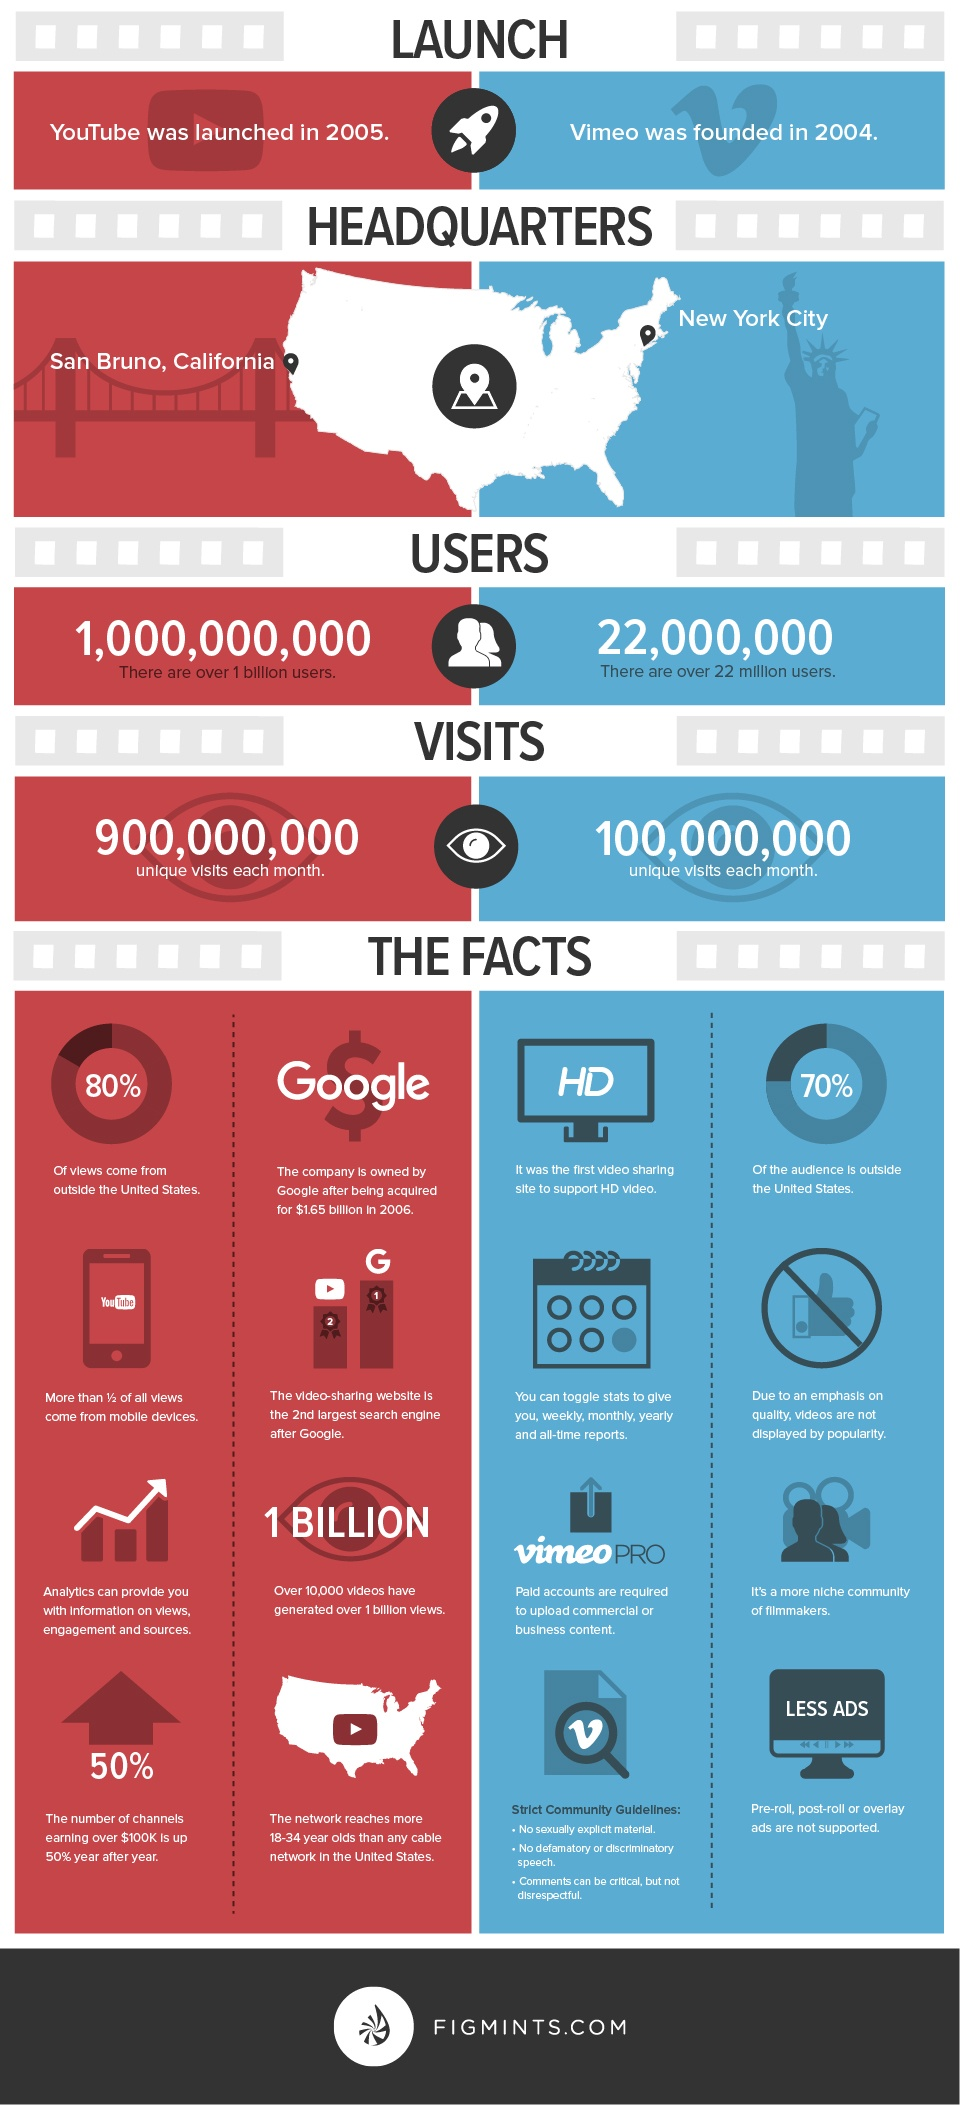 figmints_offer_youtubeVSvimeo-infographic-bottom.jpg